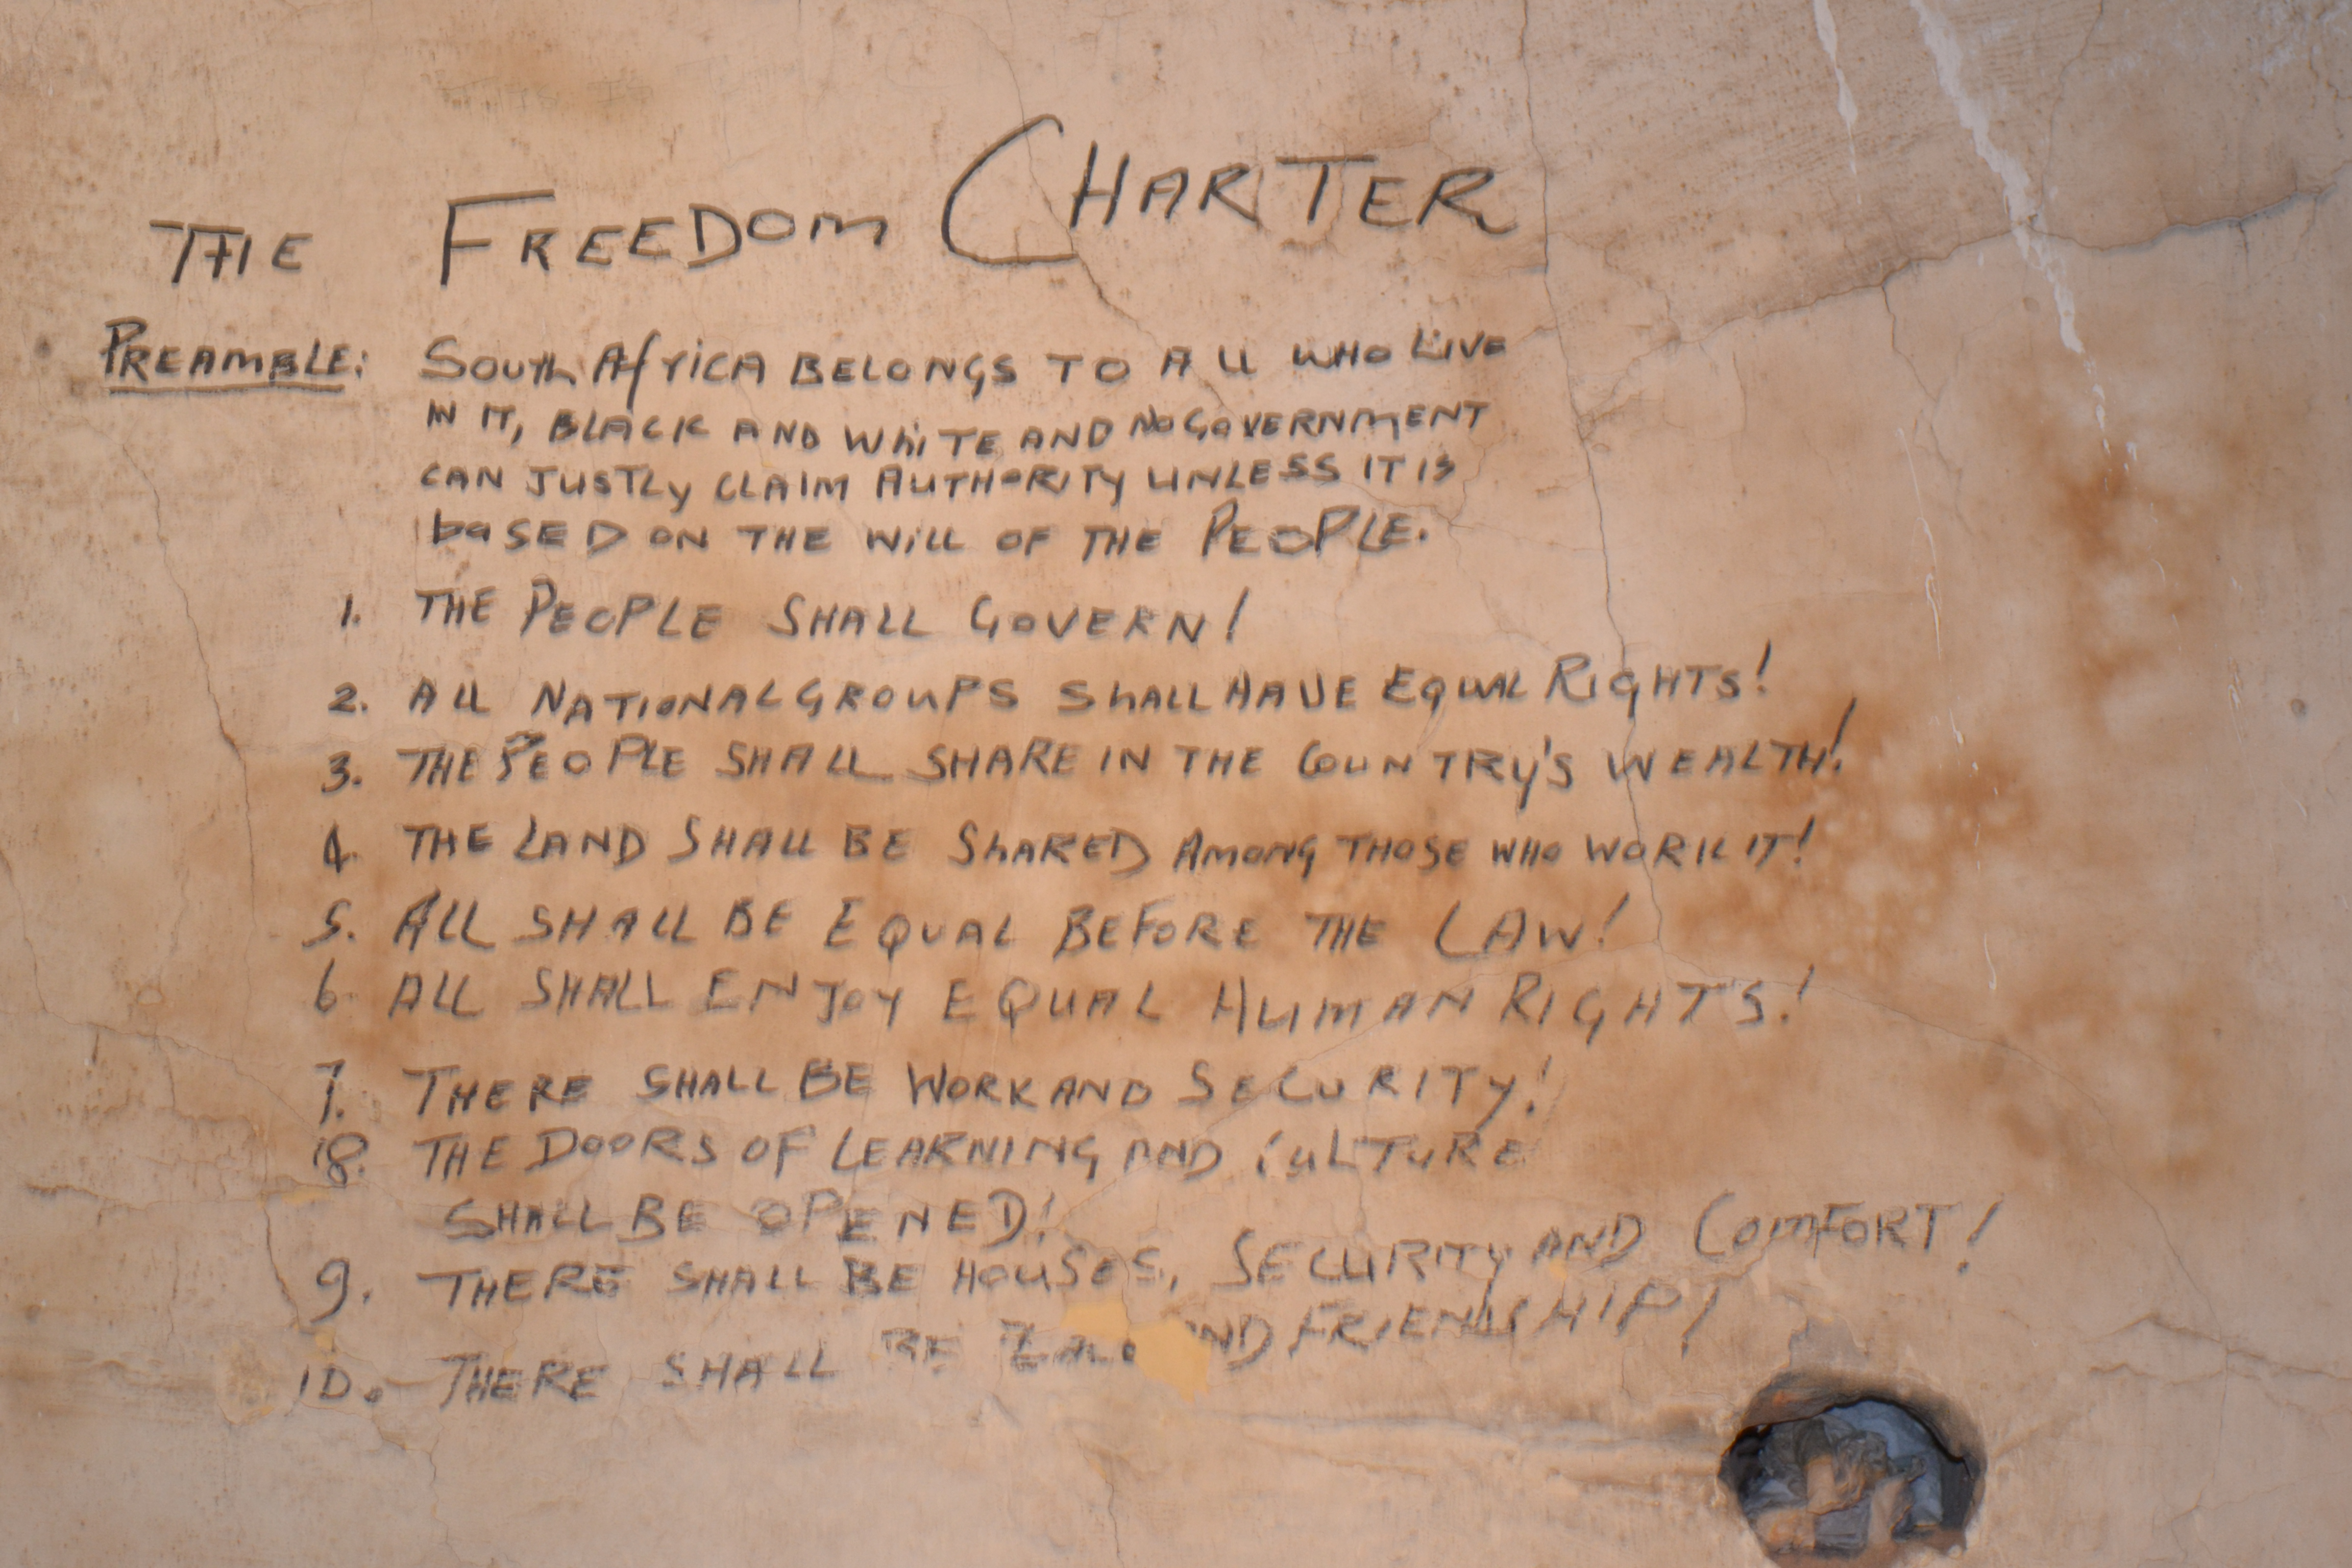 Freedom Charter Pdf